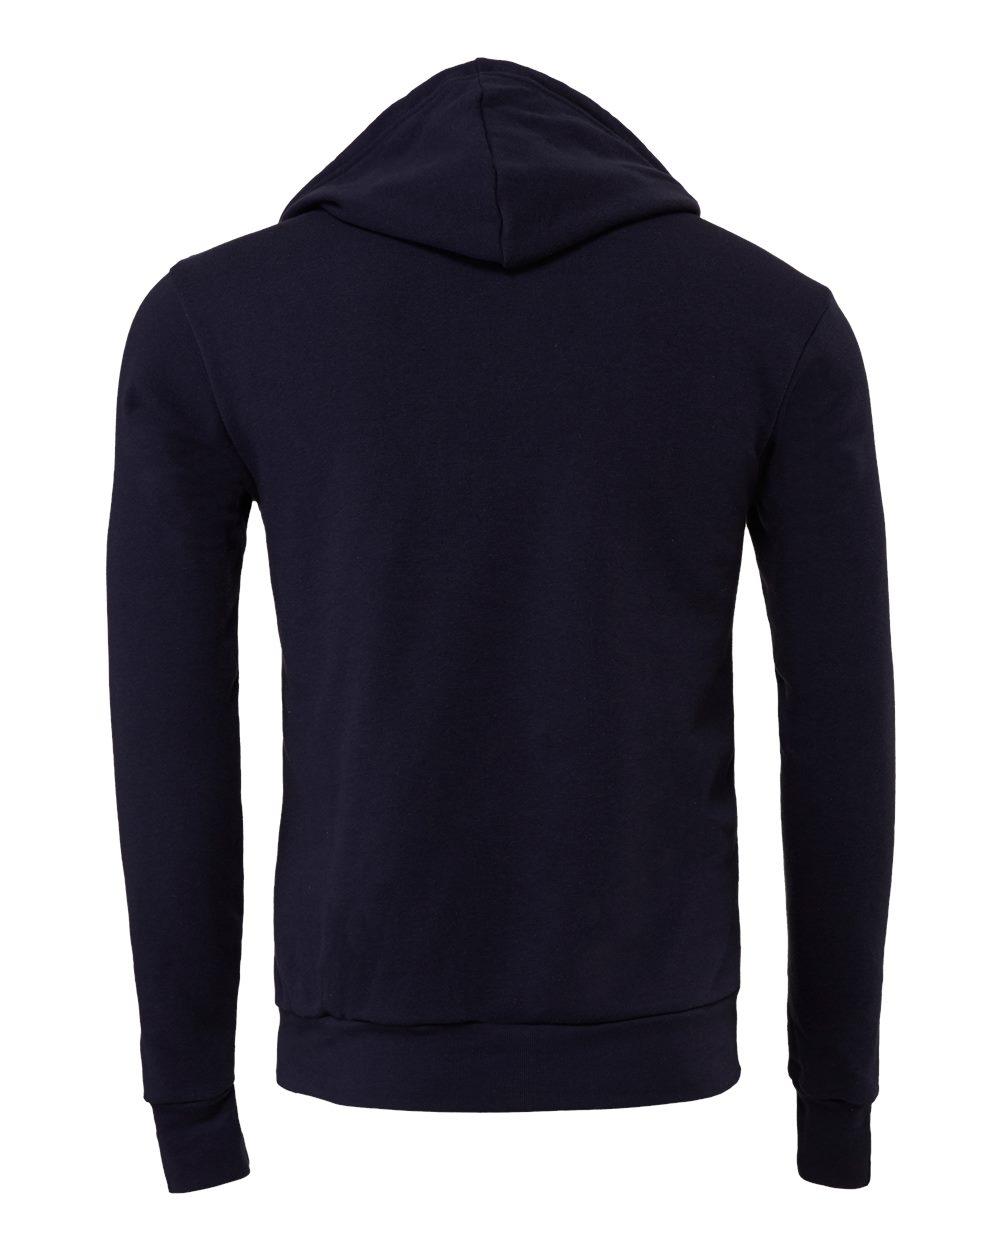 Bella-Canvas-Unisex-Sponge-Hooded-Pullover-Sweatshirt-Blank-3719-up-to-2XL thumbnail 80